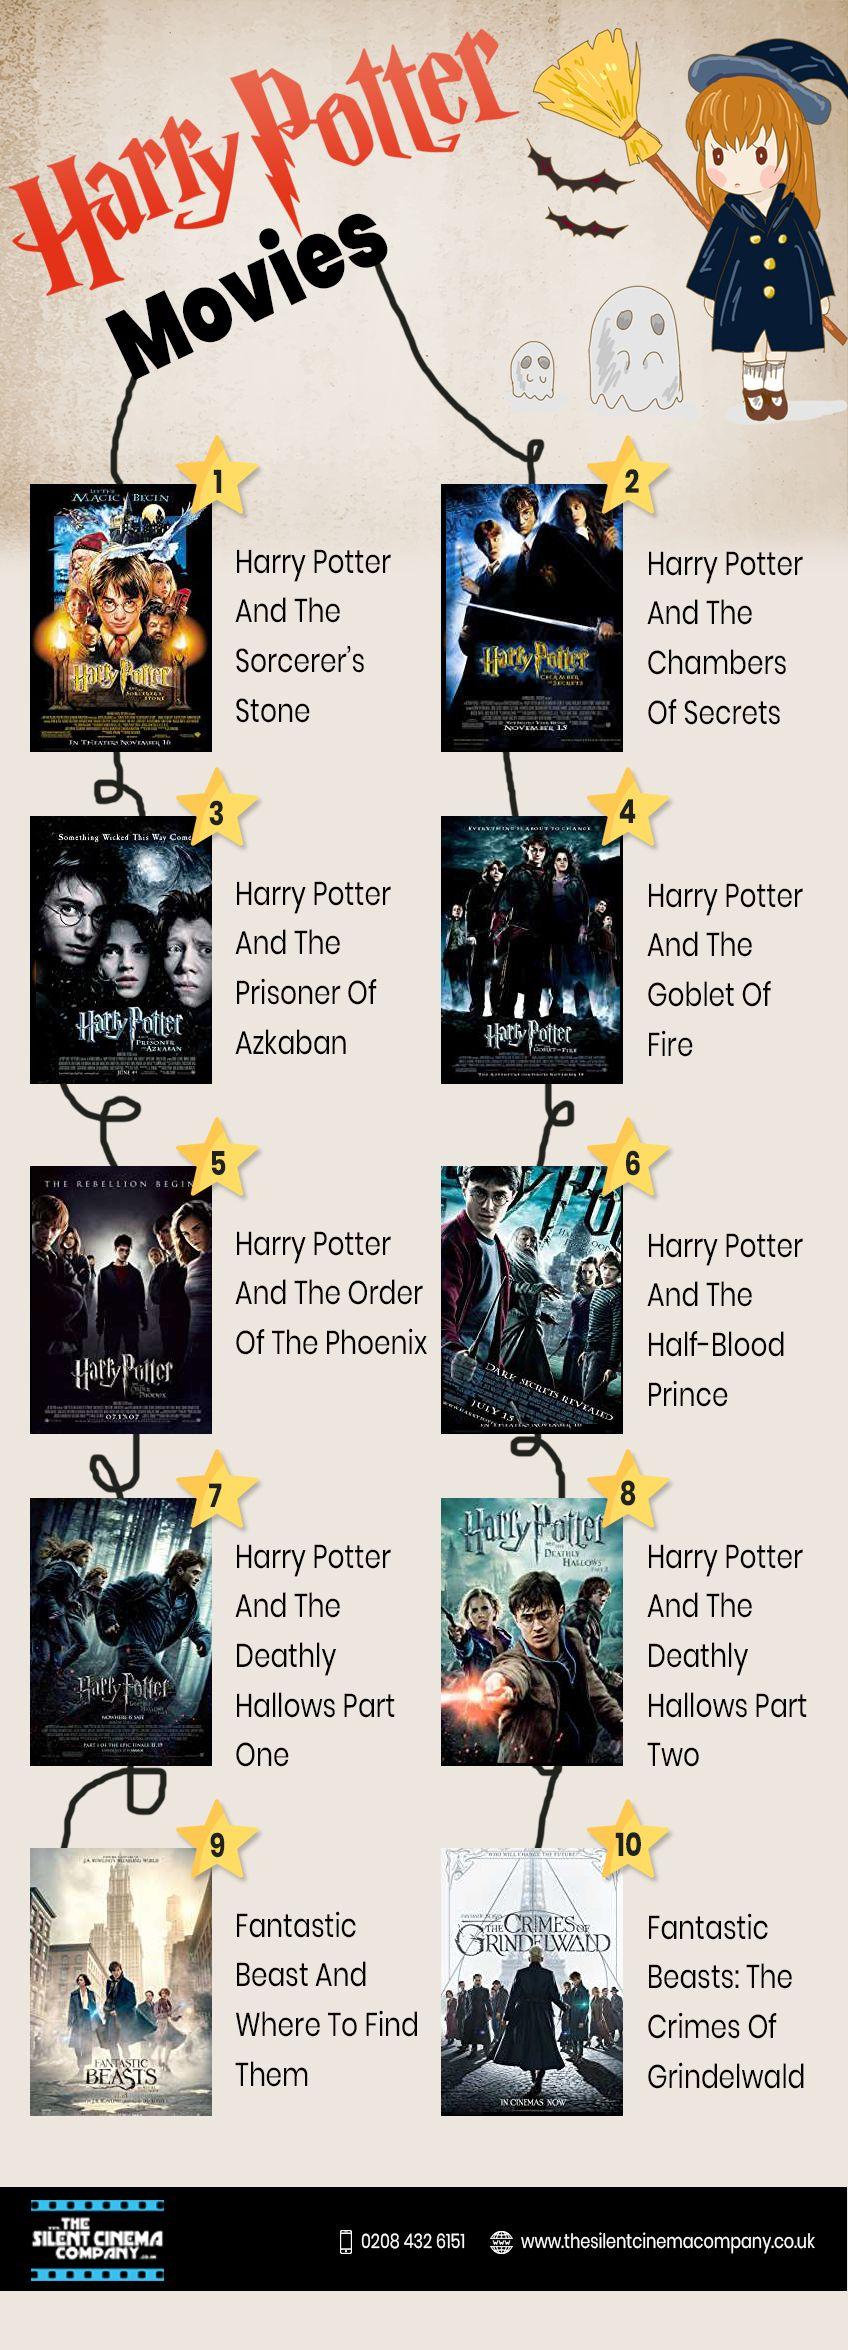 Harry Potter Movies Harry Potter Movies Harry Potter Movie Order First Harry Potter Movie